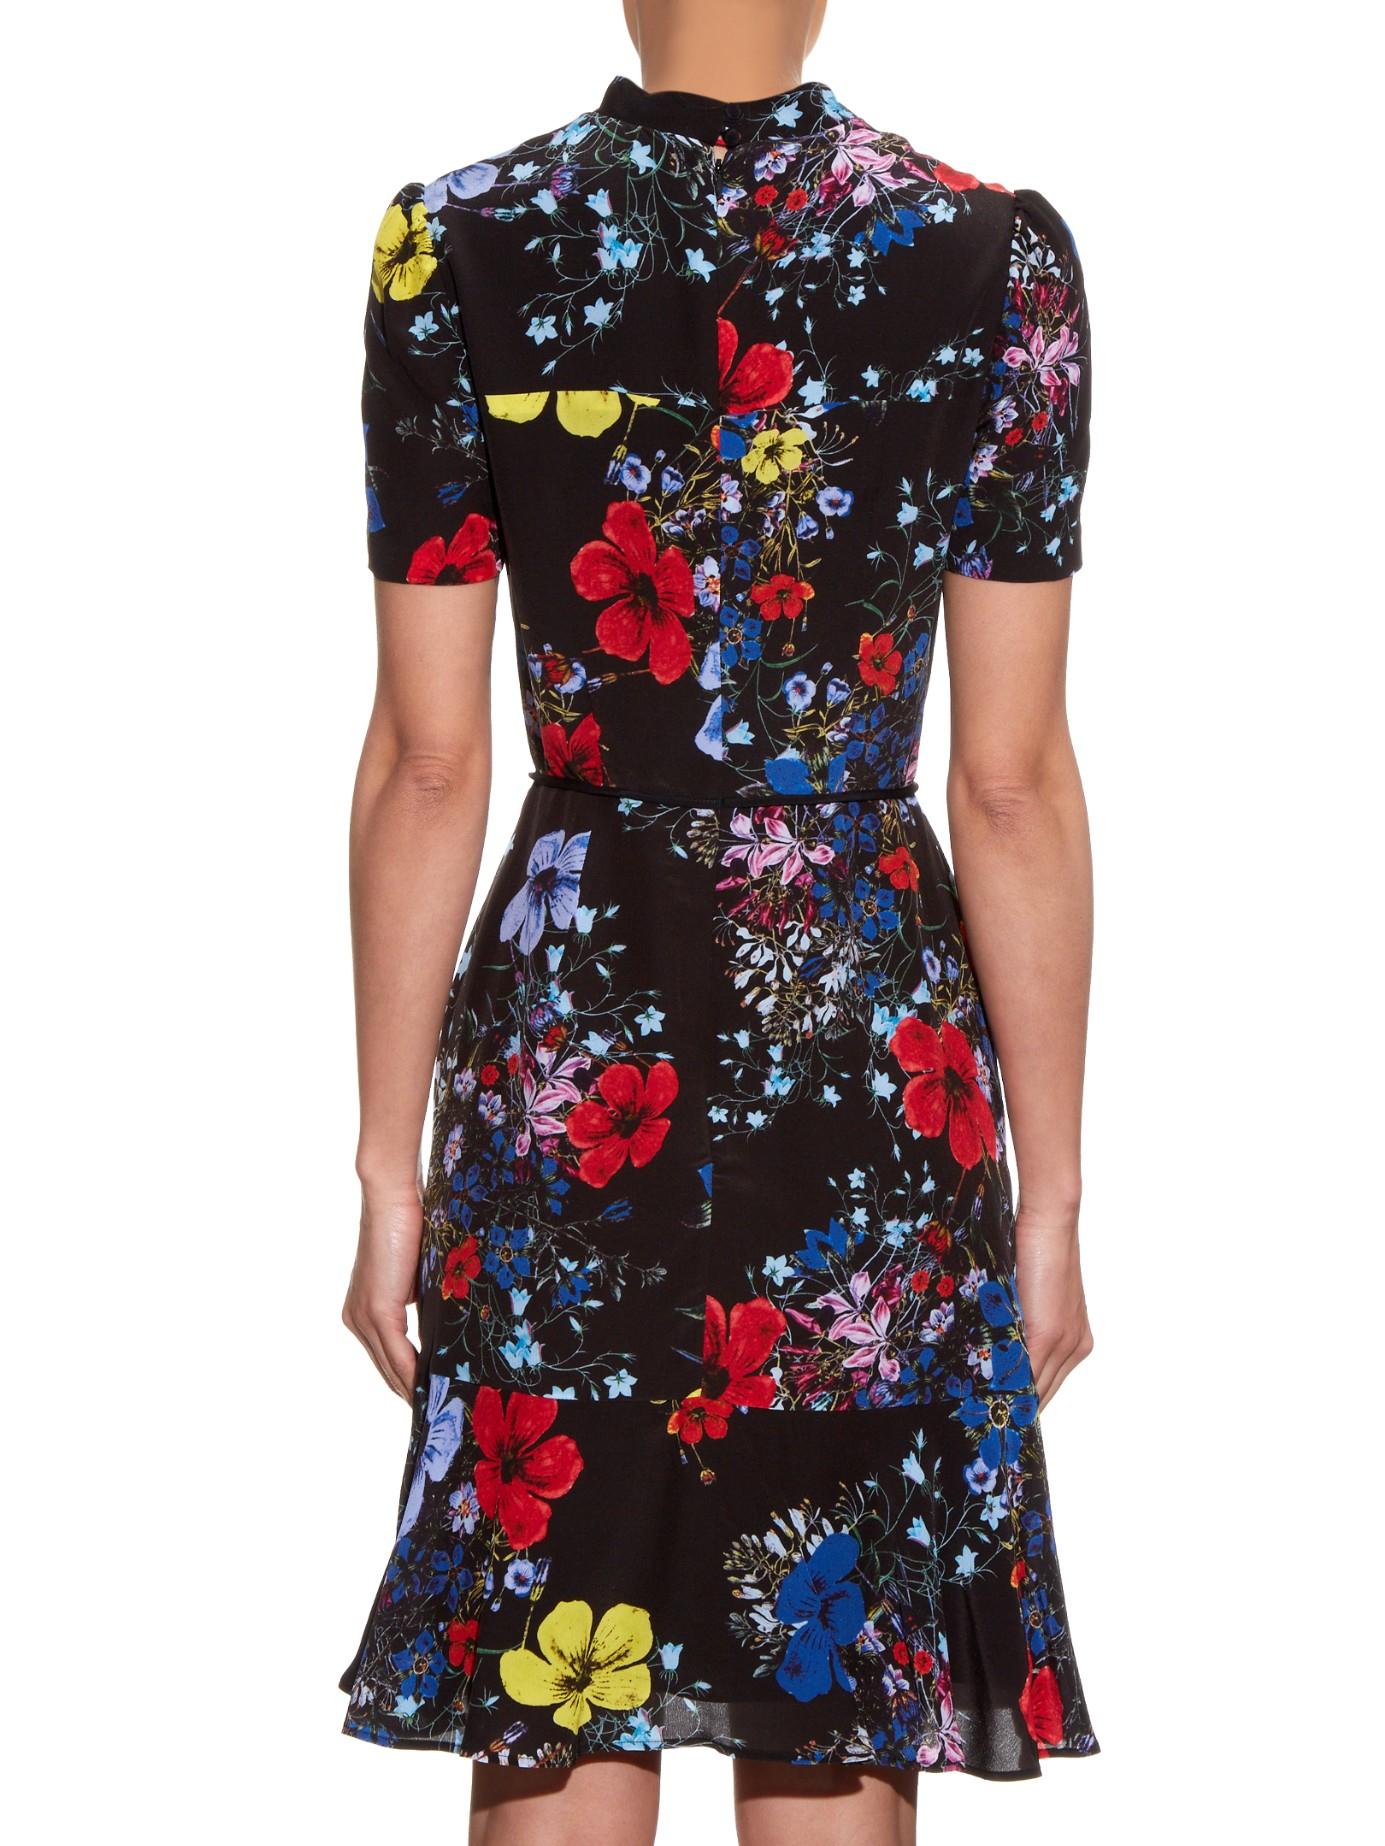 515811953c7638 Lyst - Erdem Anne Short-sleeved Floral-print Dress in Black